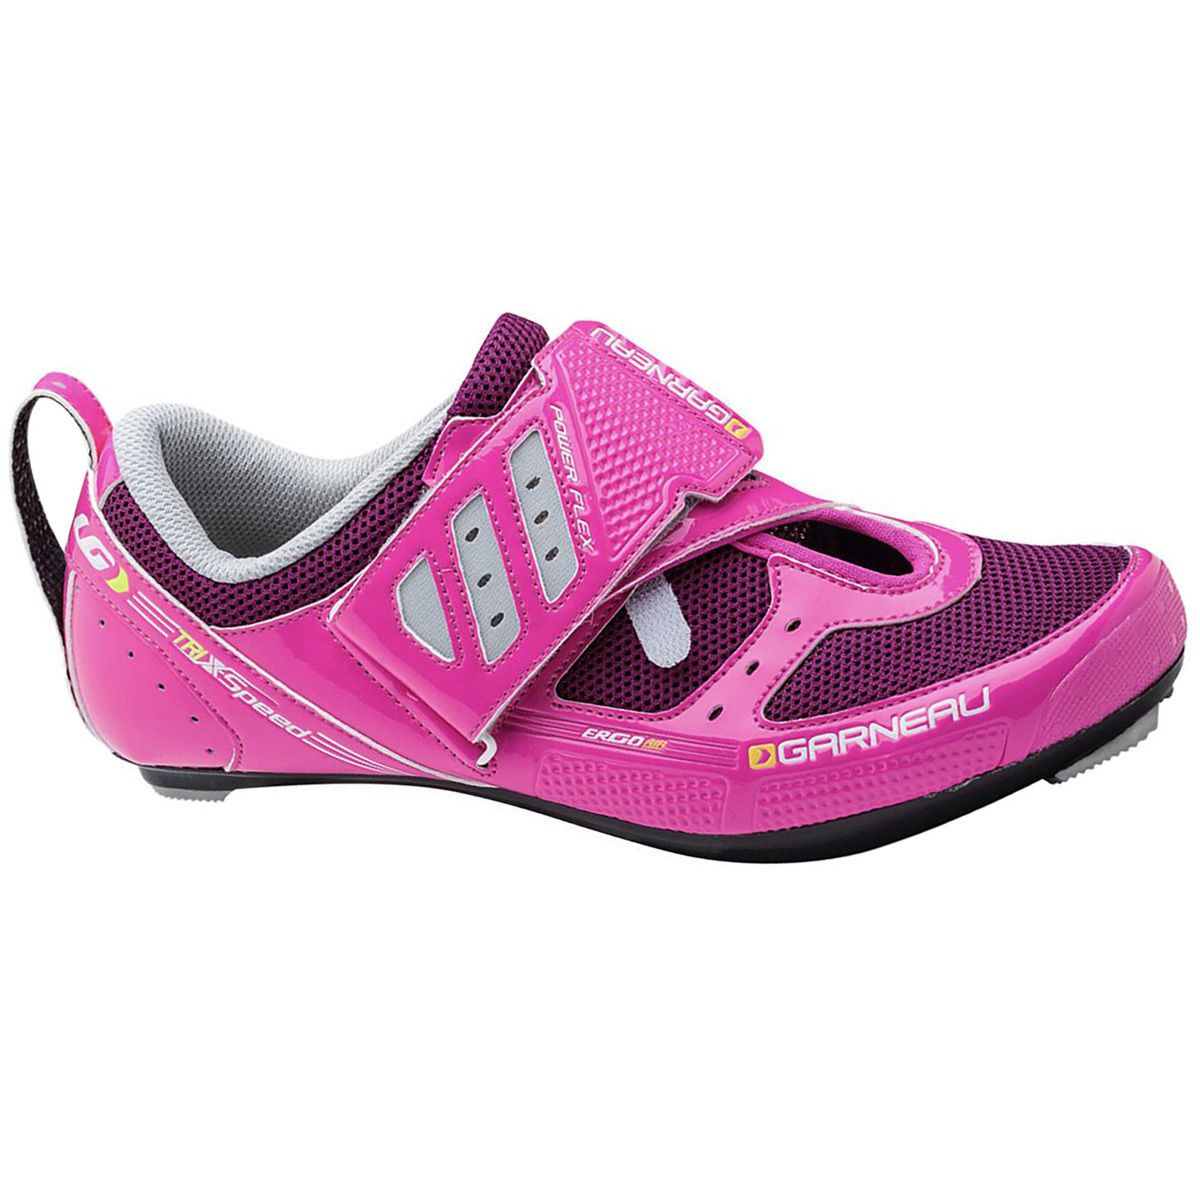 Louis Garneau Tri X Speed Ii Shoes Men S